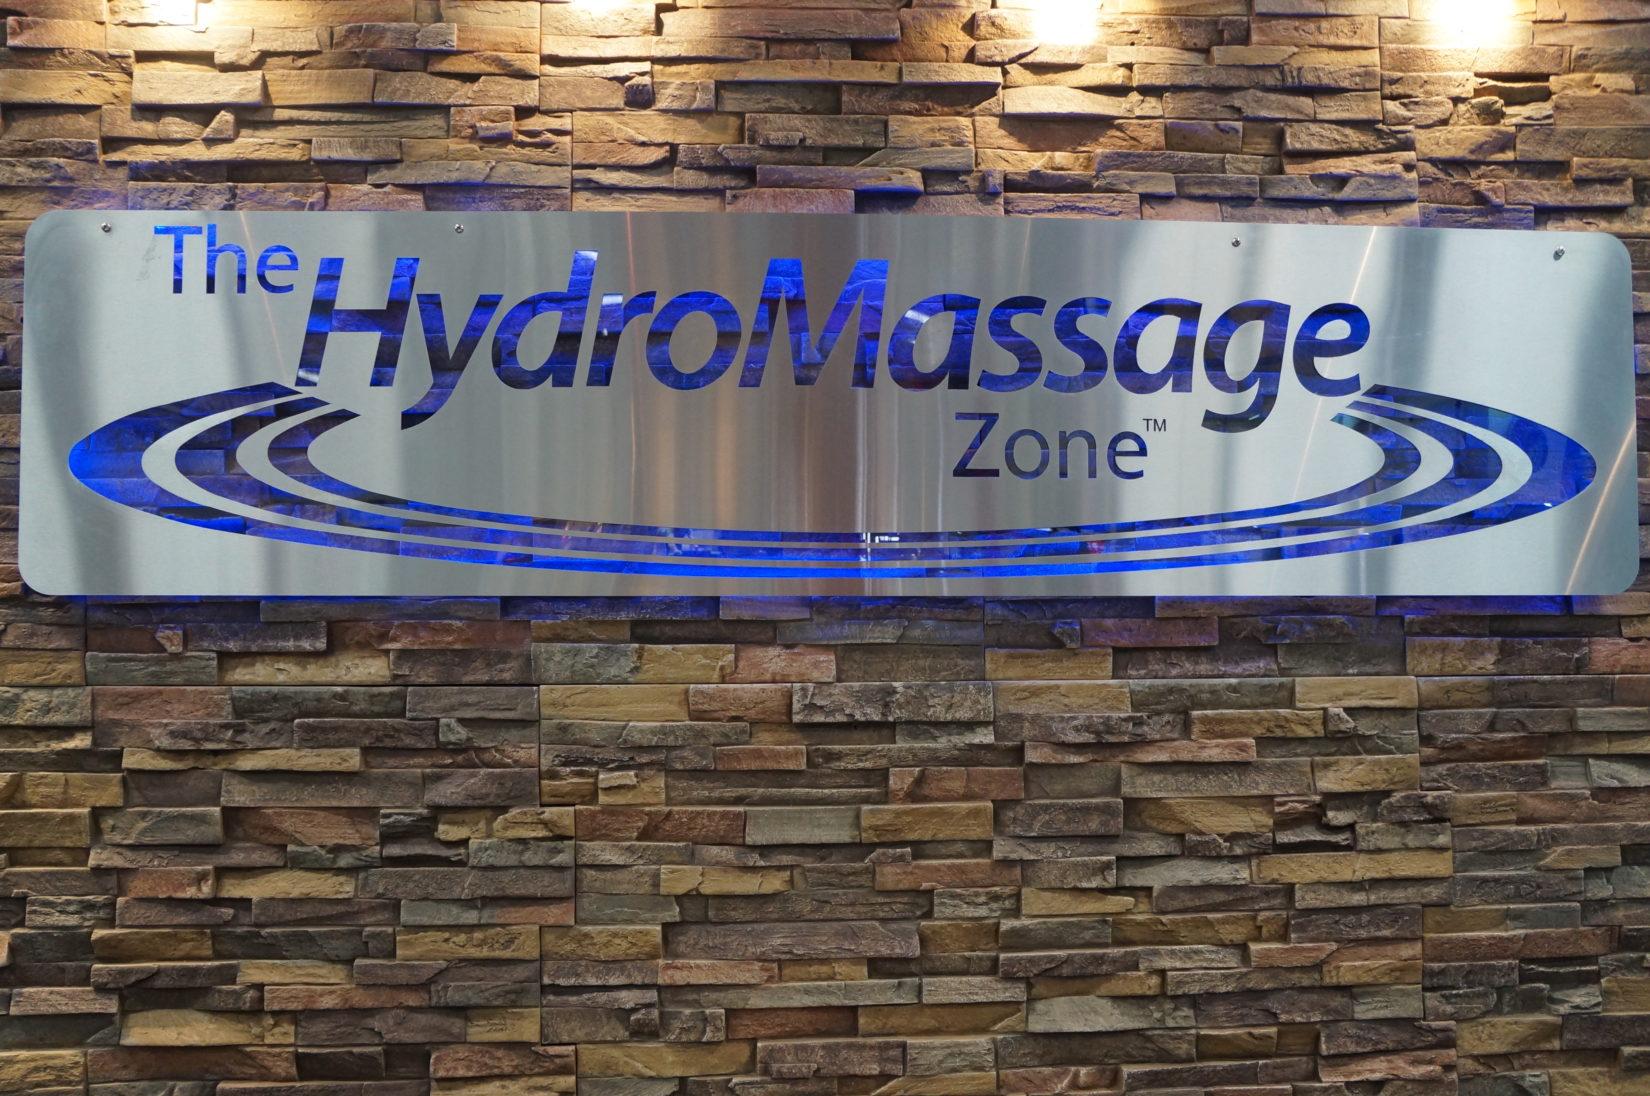 HydroMassage Zone Sign